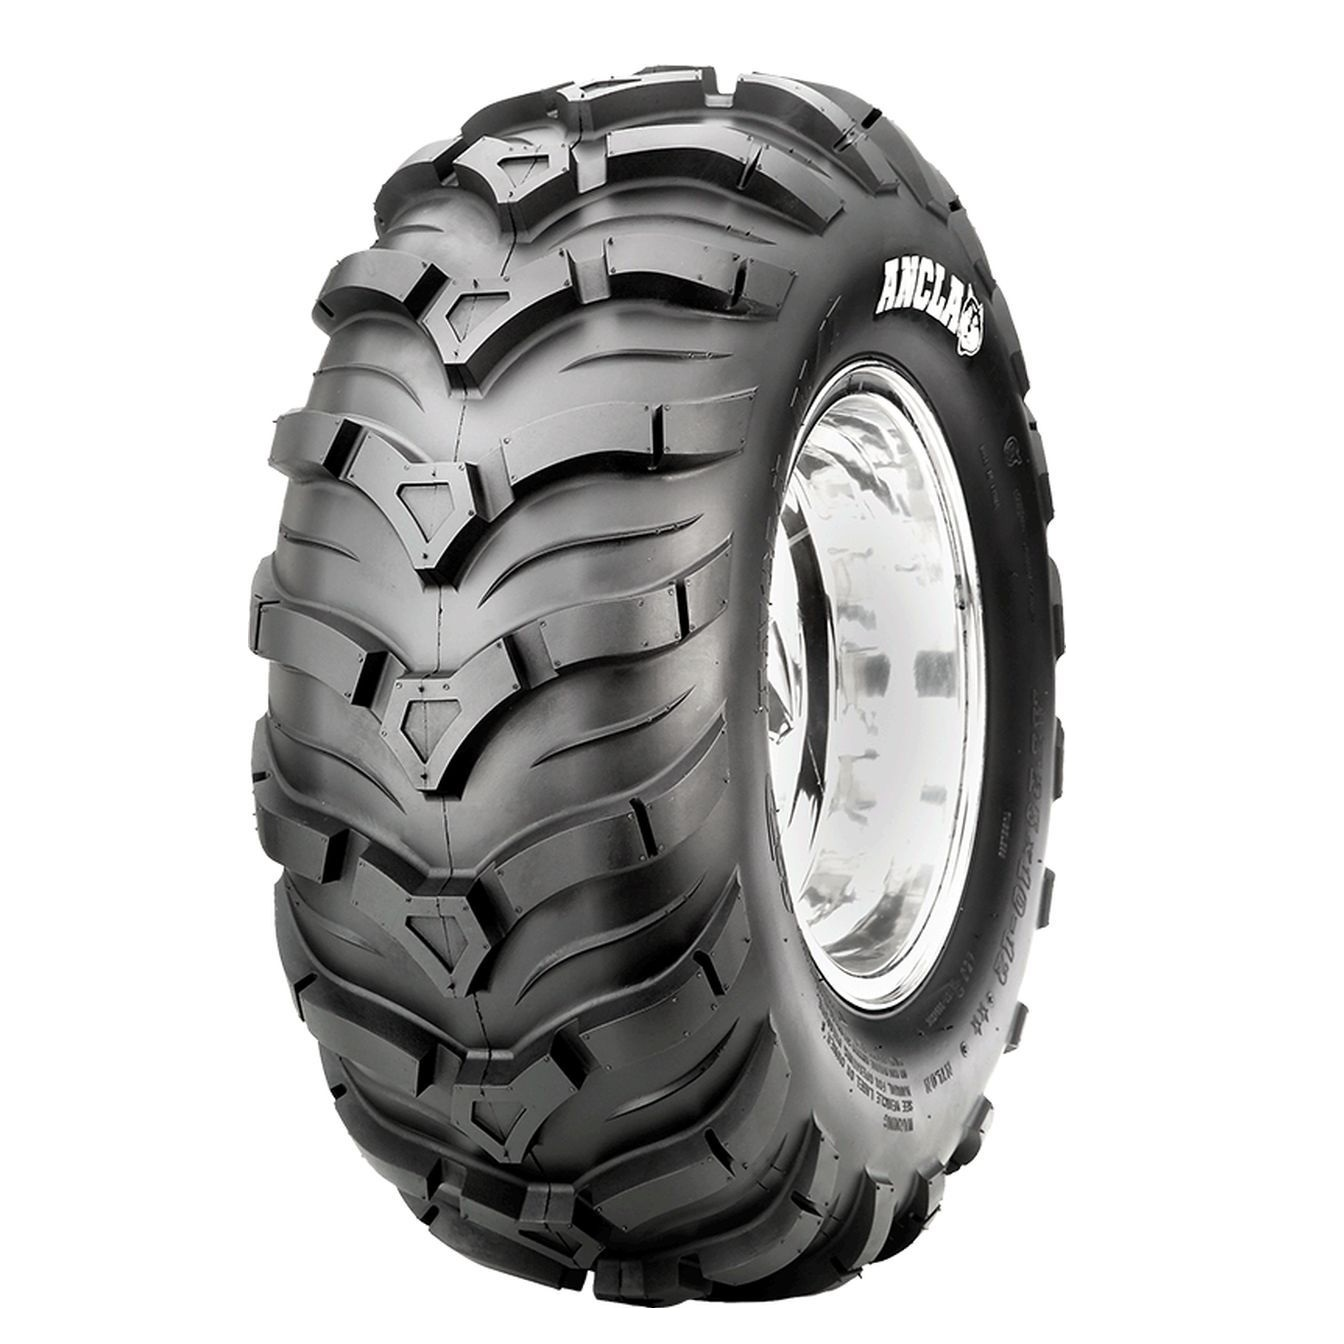 CST ANCLA pneumatika 25X10-12 4PR (51M)